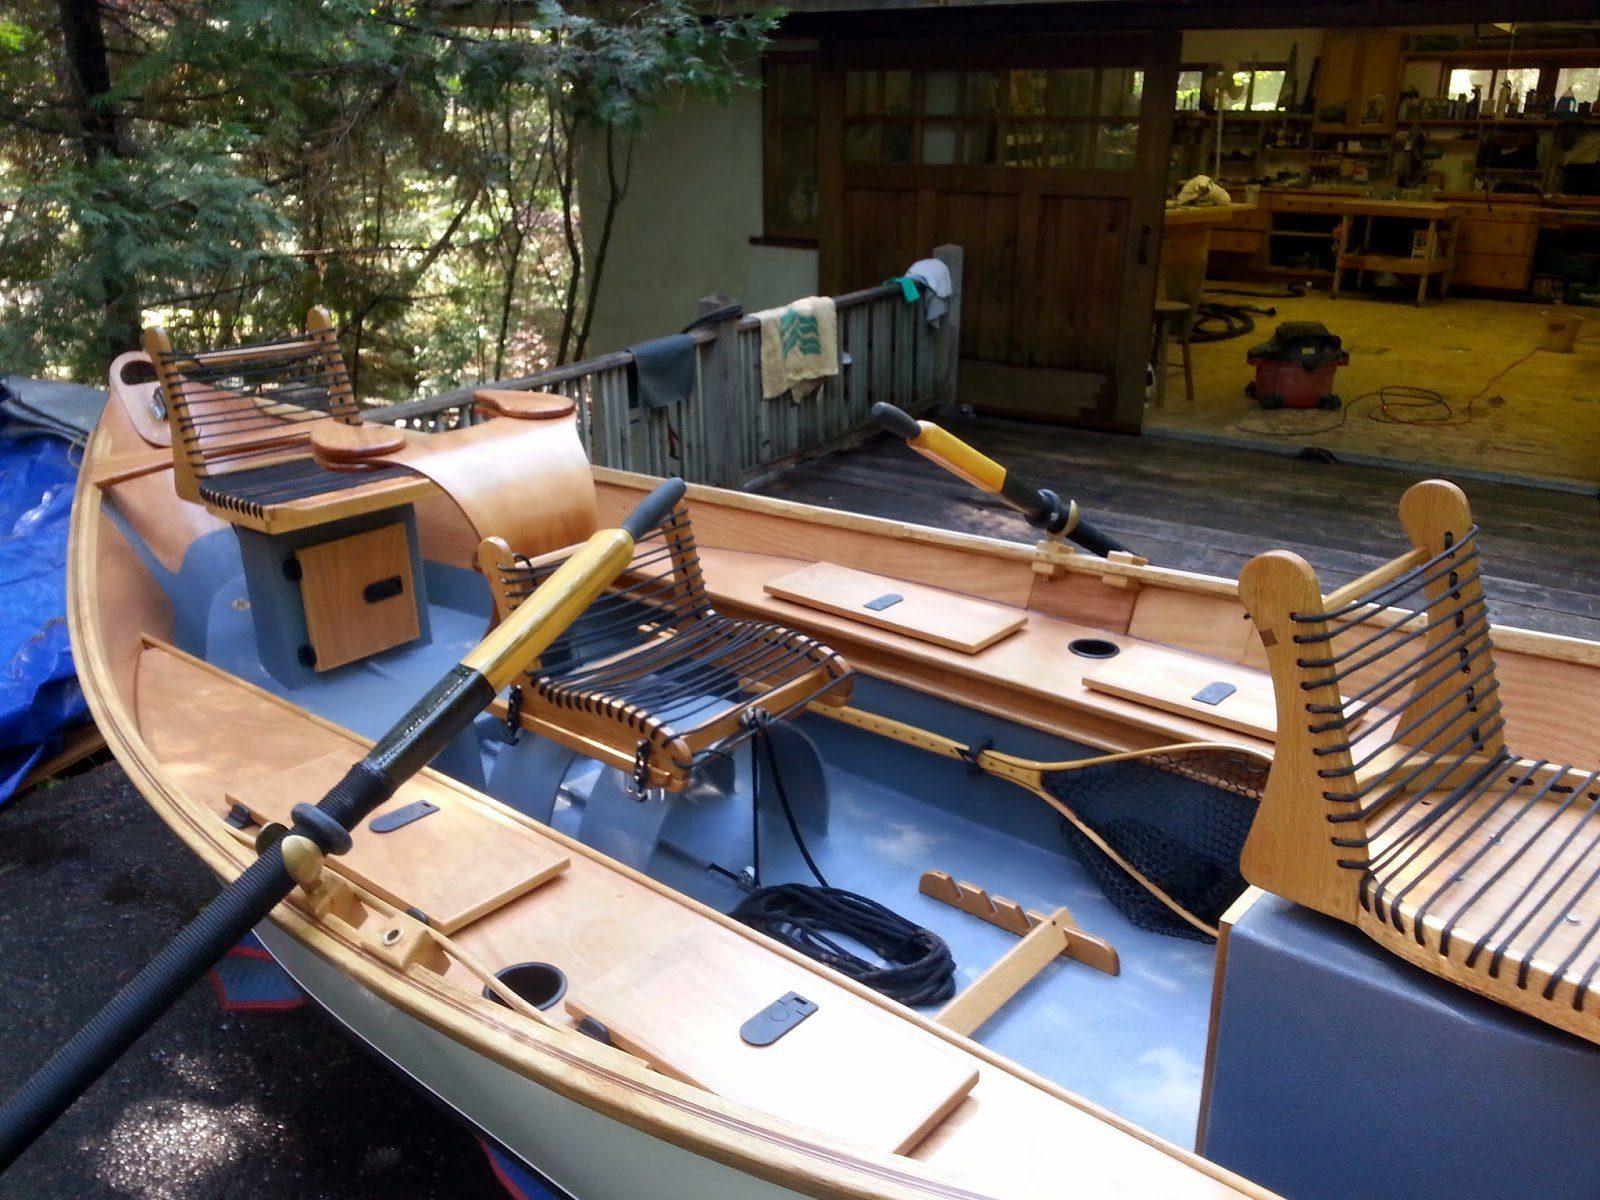 pin on pinterest boat pedestal deck by springfield jake christiansen fishing